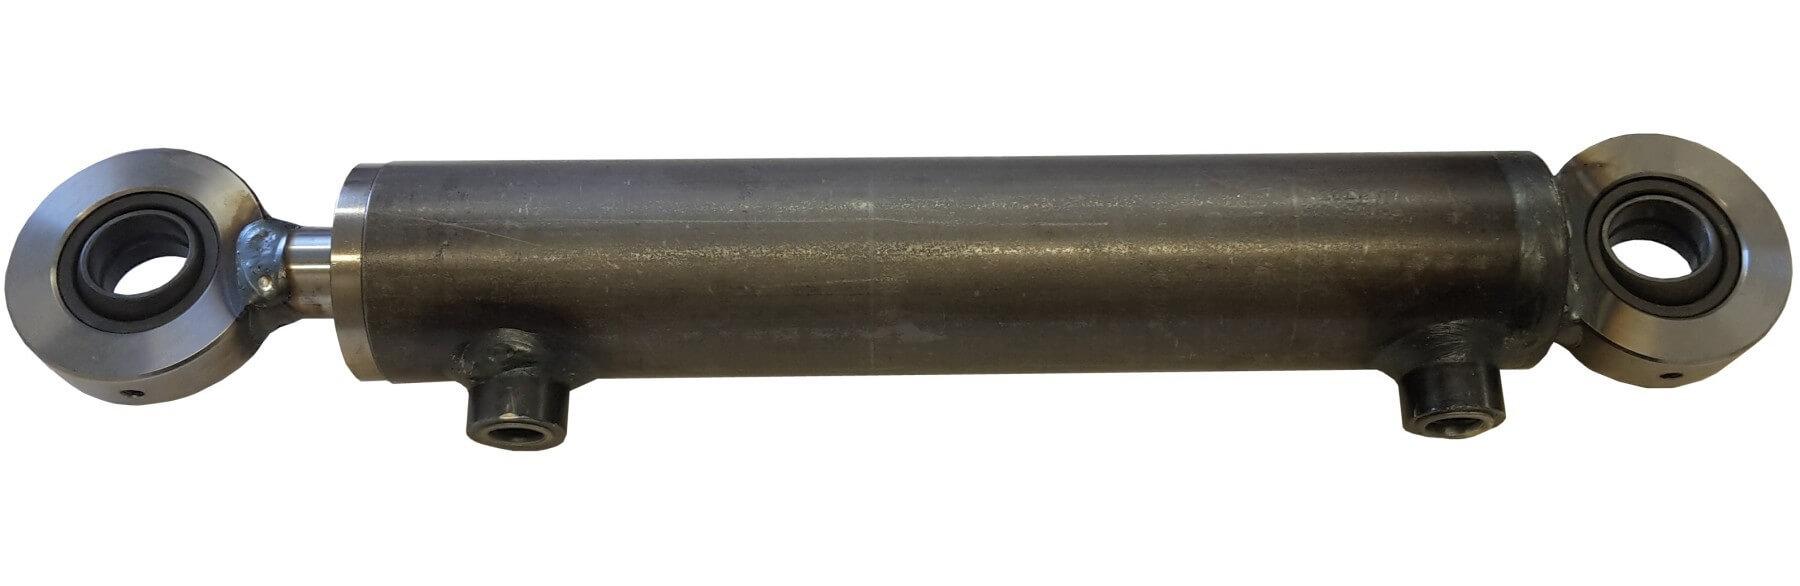 Hydraulisylinteri CL 50. 30. 550 GE